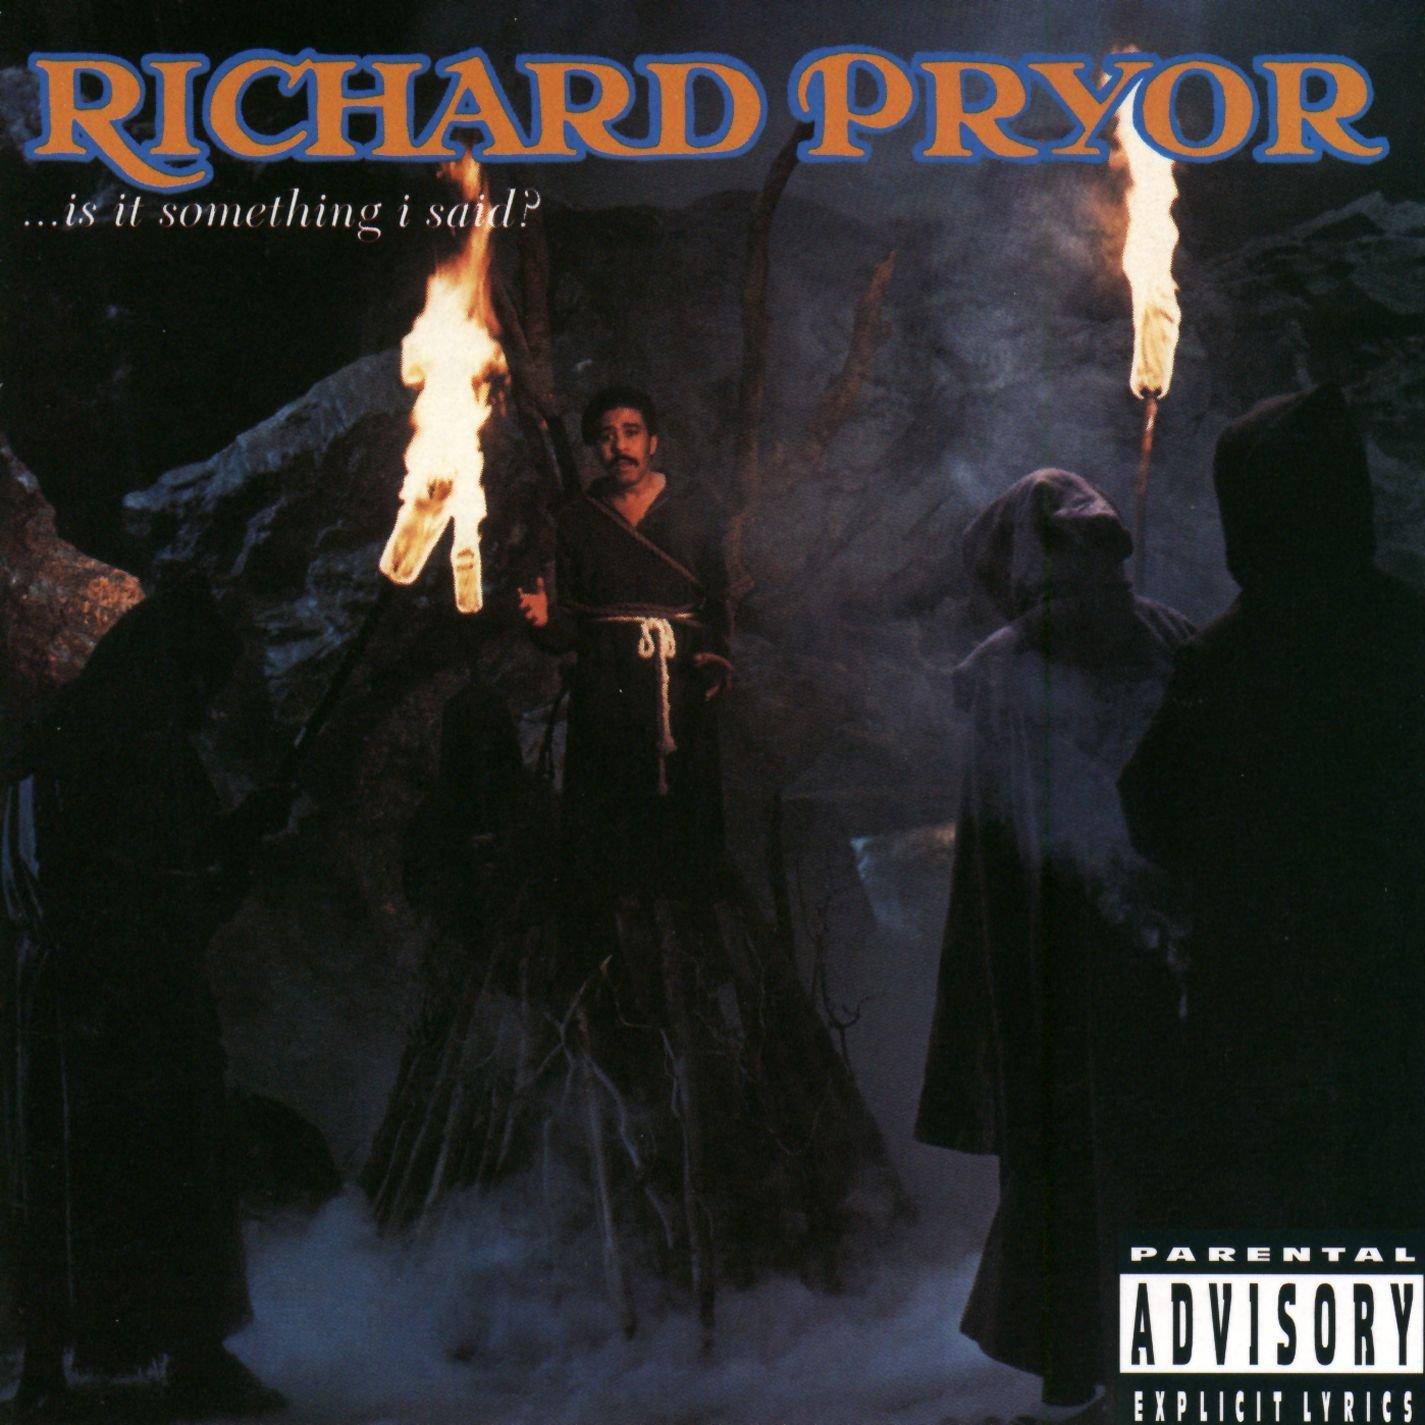 Download Filme Richard Pryor: Is It Something I Said? Torrent 2021 Qualidade Hd